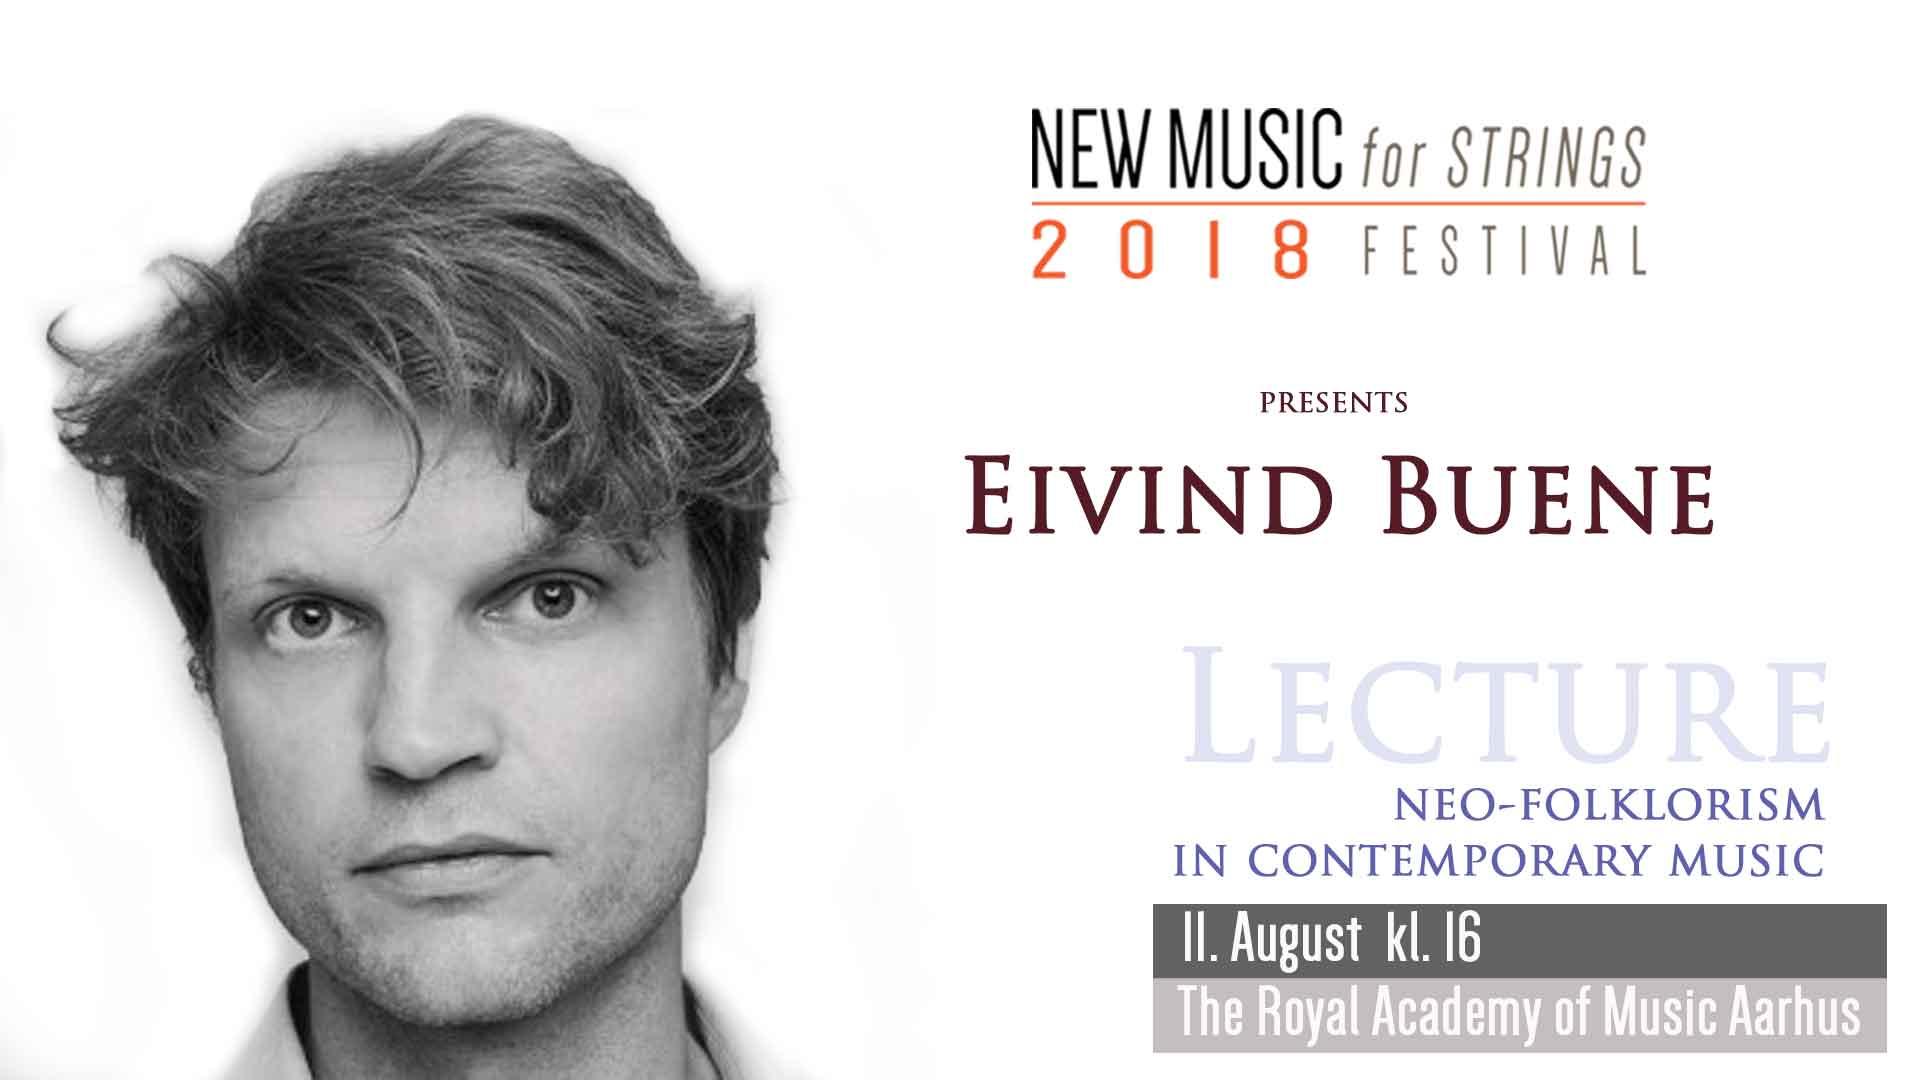 Eivind_Buene_NMFS_lecture.jpg